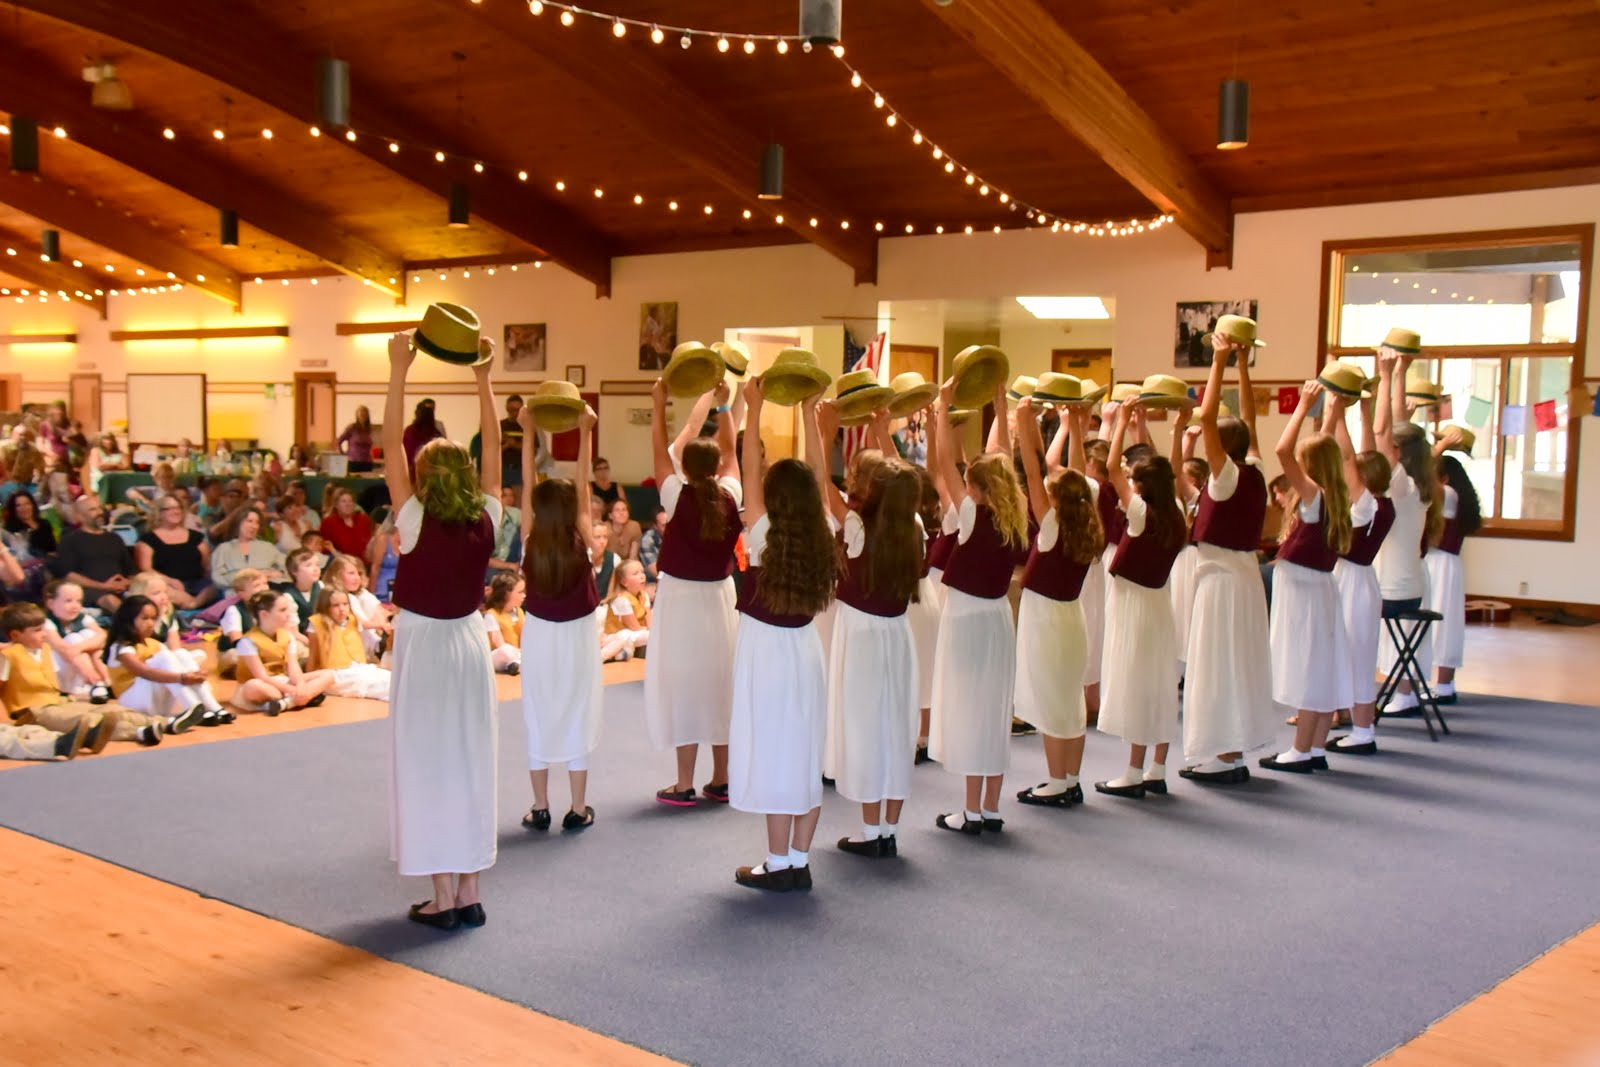 Bija Concert Choir at CYO Camp Lodge, Summerfest Concert June 2017